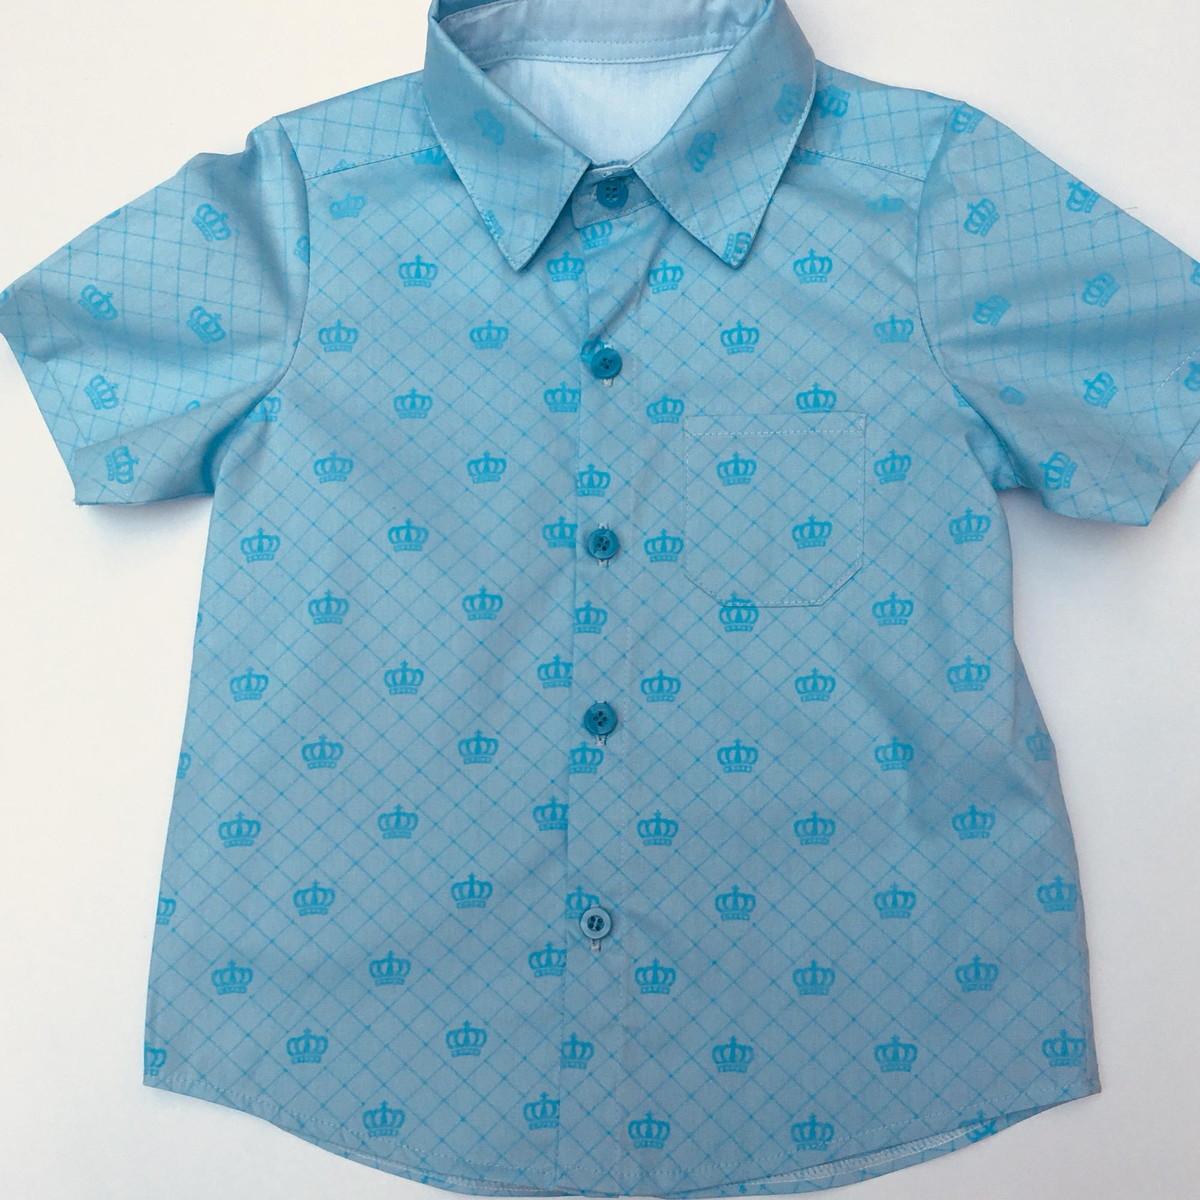 6f72c1d24 Camisa coroa azul no Elo7 | vestemenina,vestemenino! (C14EE7)